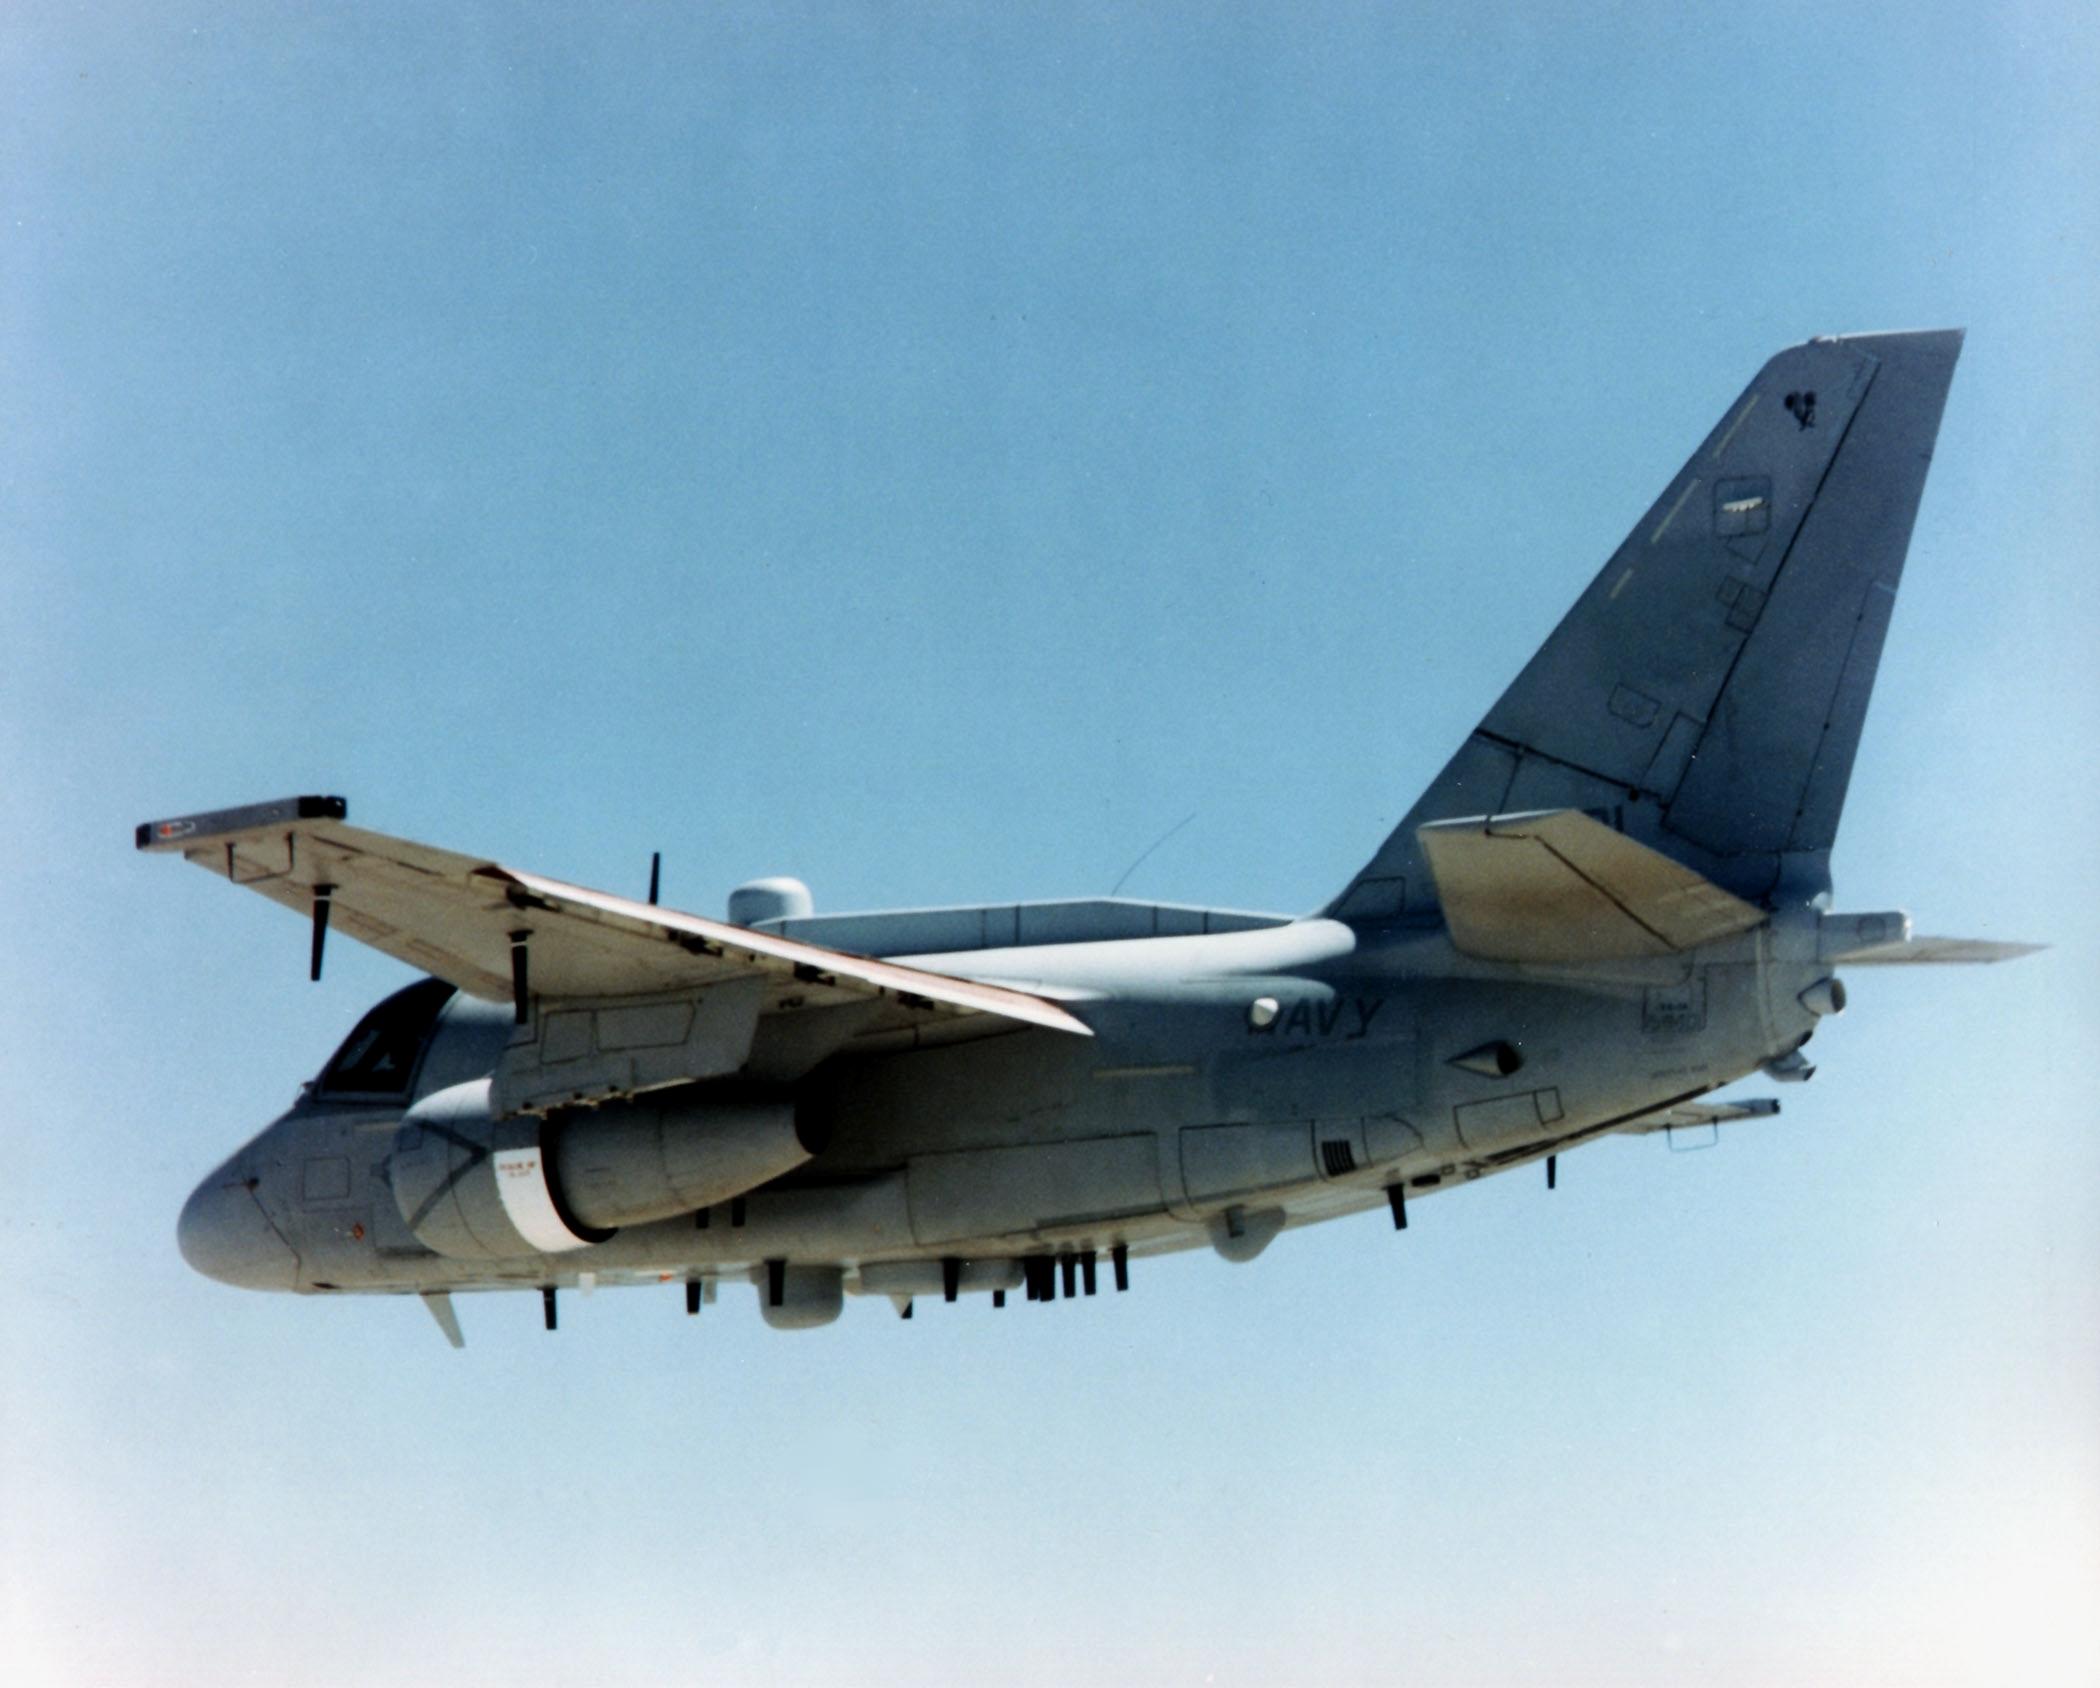 ES-3A_Shadow_VQ-6_in_flight_off_Florida.